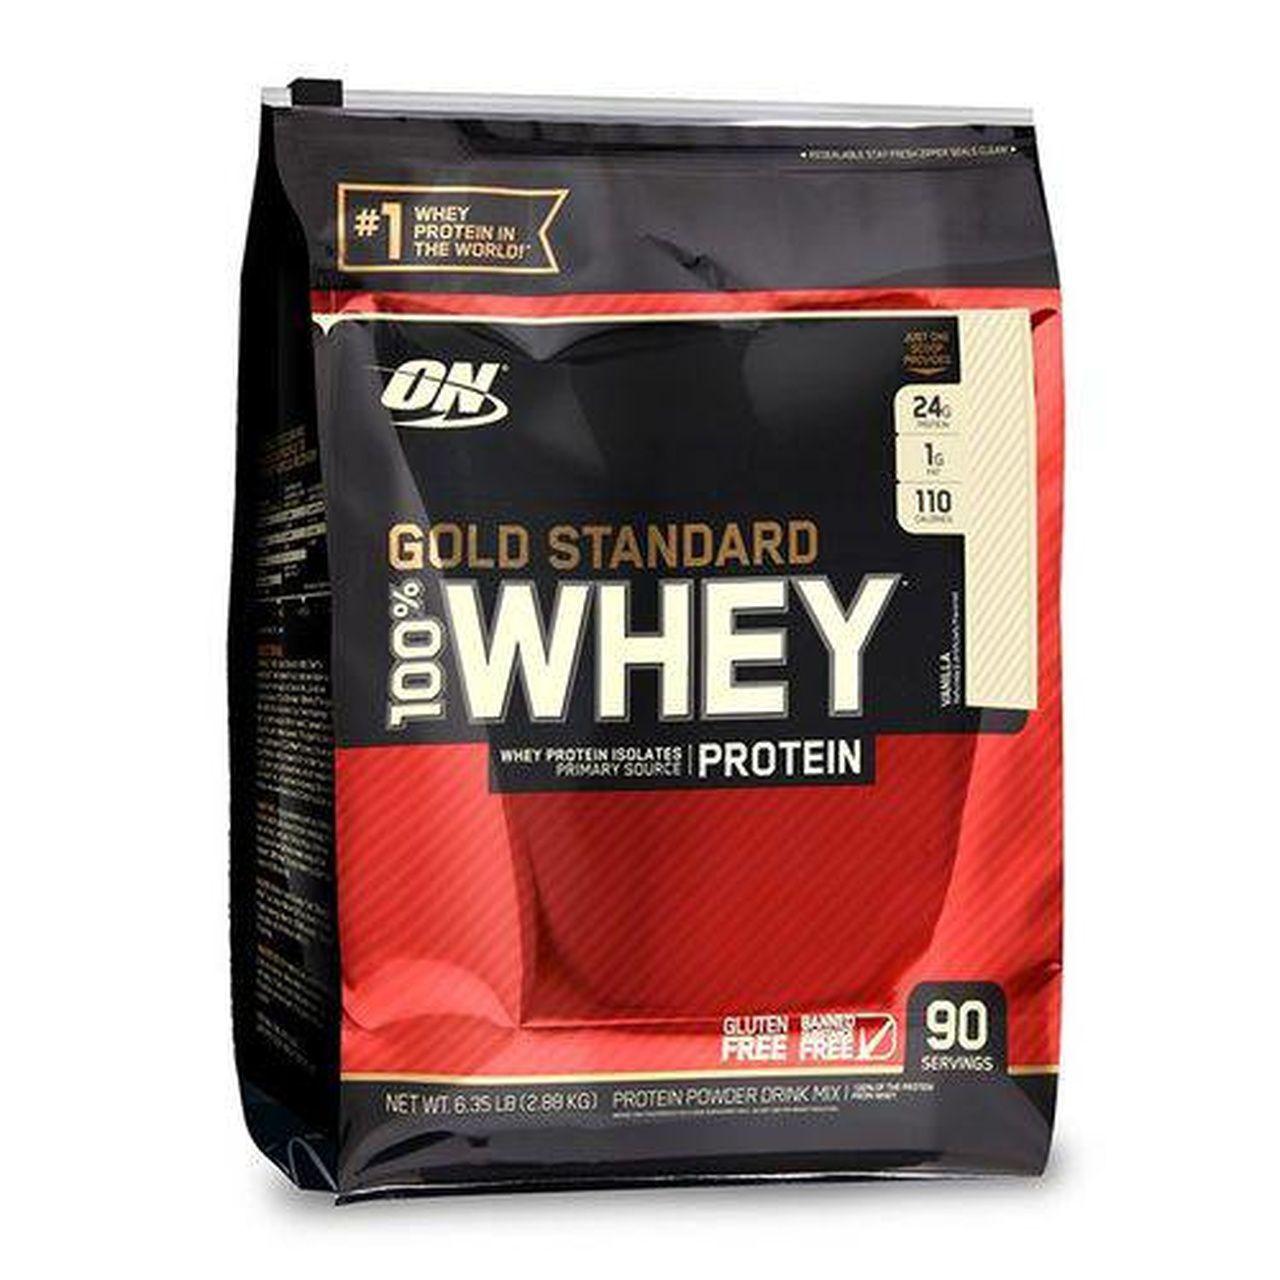 100% Whey Gold Standard (6.35Lbs/2.88kg) - Optimum Nutrition